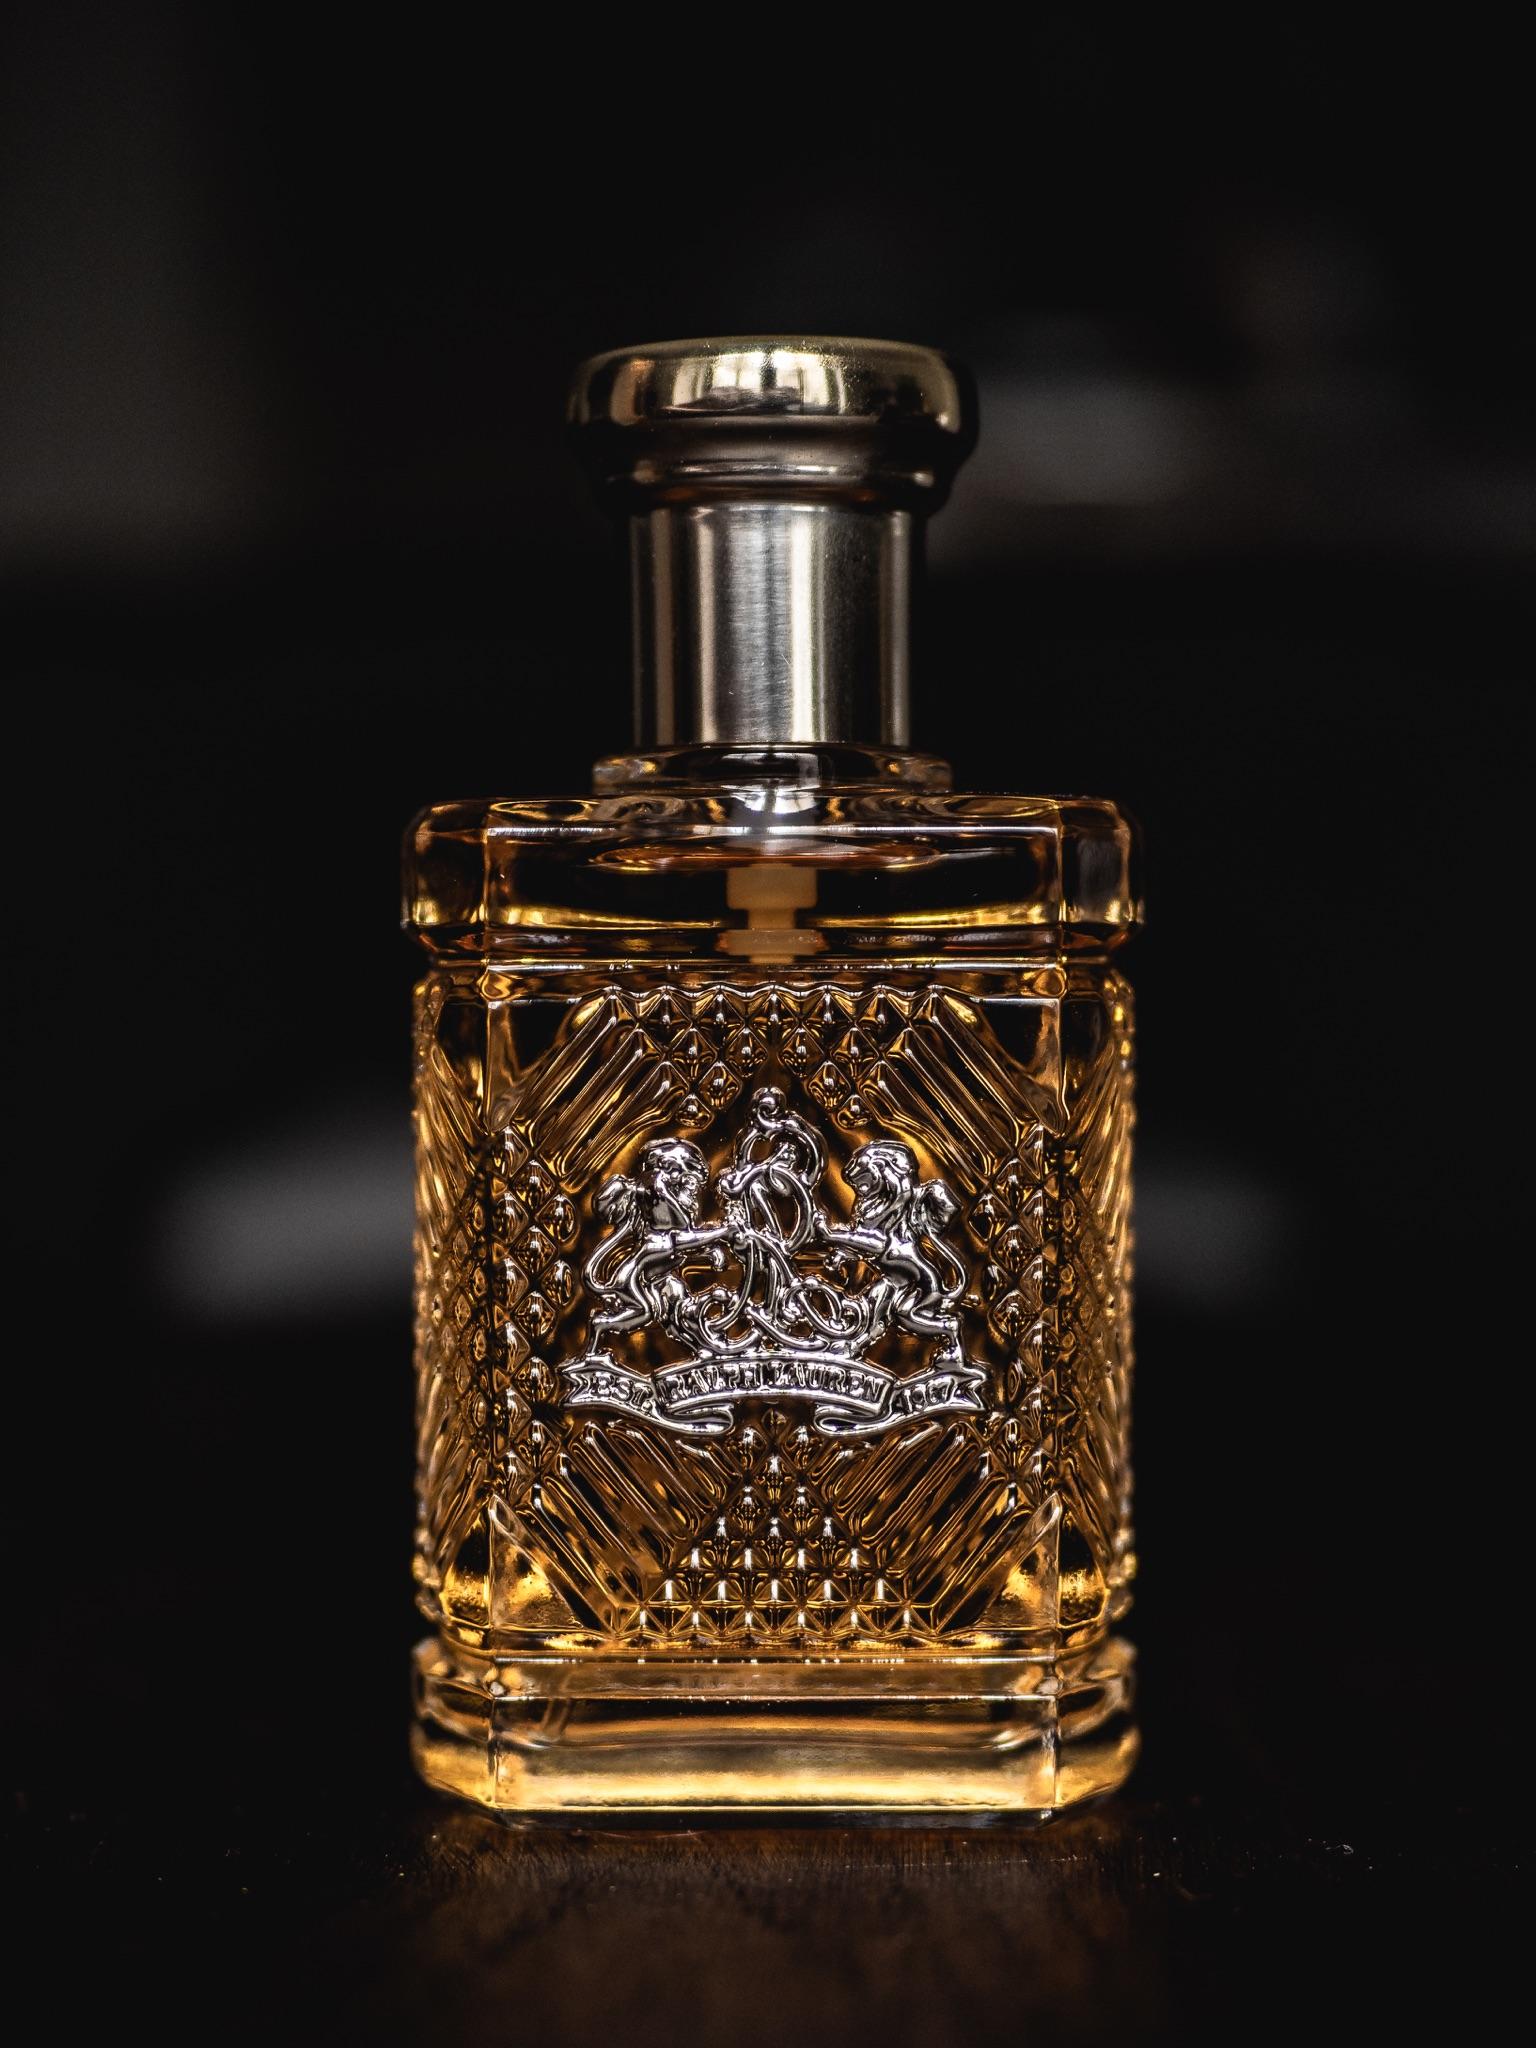 Safari by Ralph Lauren for Men Fragrance Review